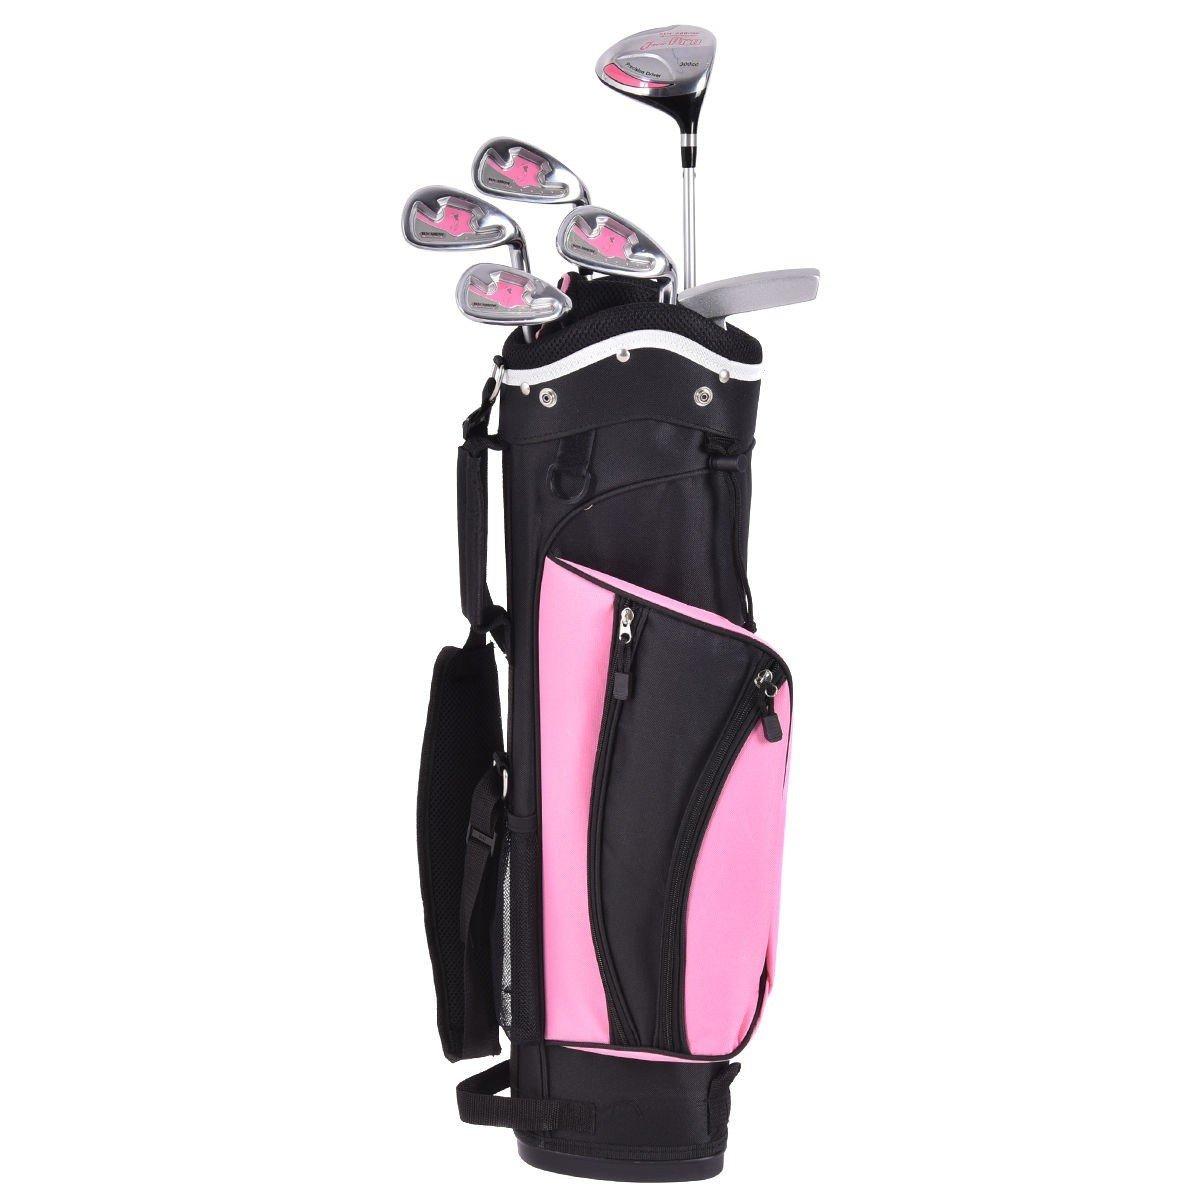 6 Piece Wood Iron Putter Golf Club Set w/ Stand Bag